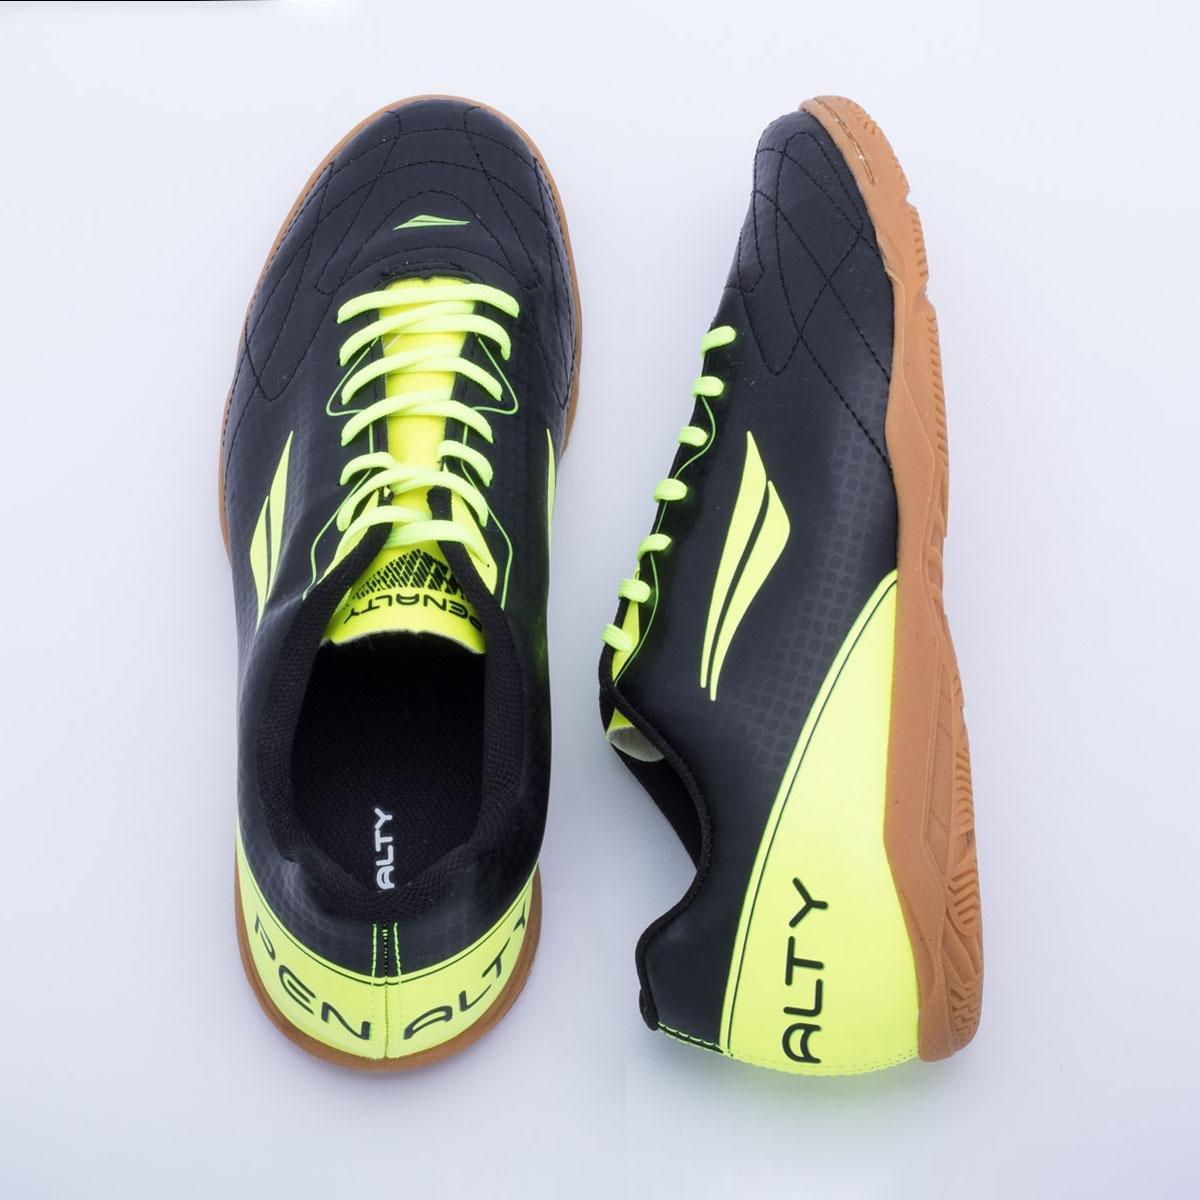 839b427a09 Chuteira Futsal Penalty Matis VIII IC Masculina - Compre Agora ...